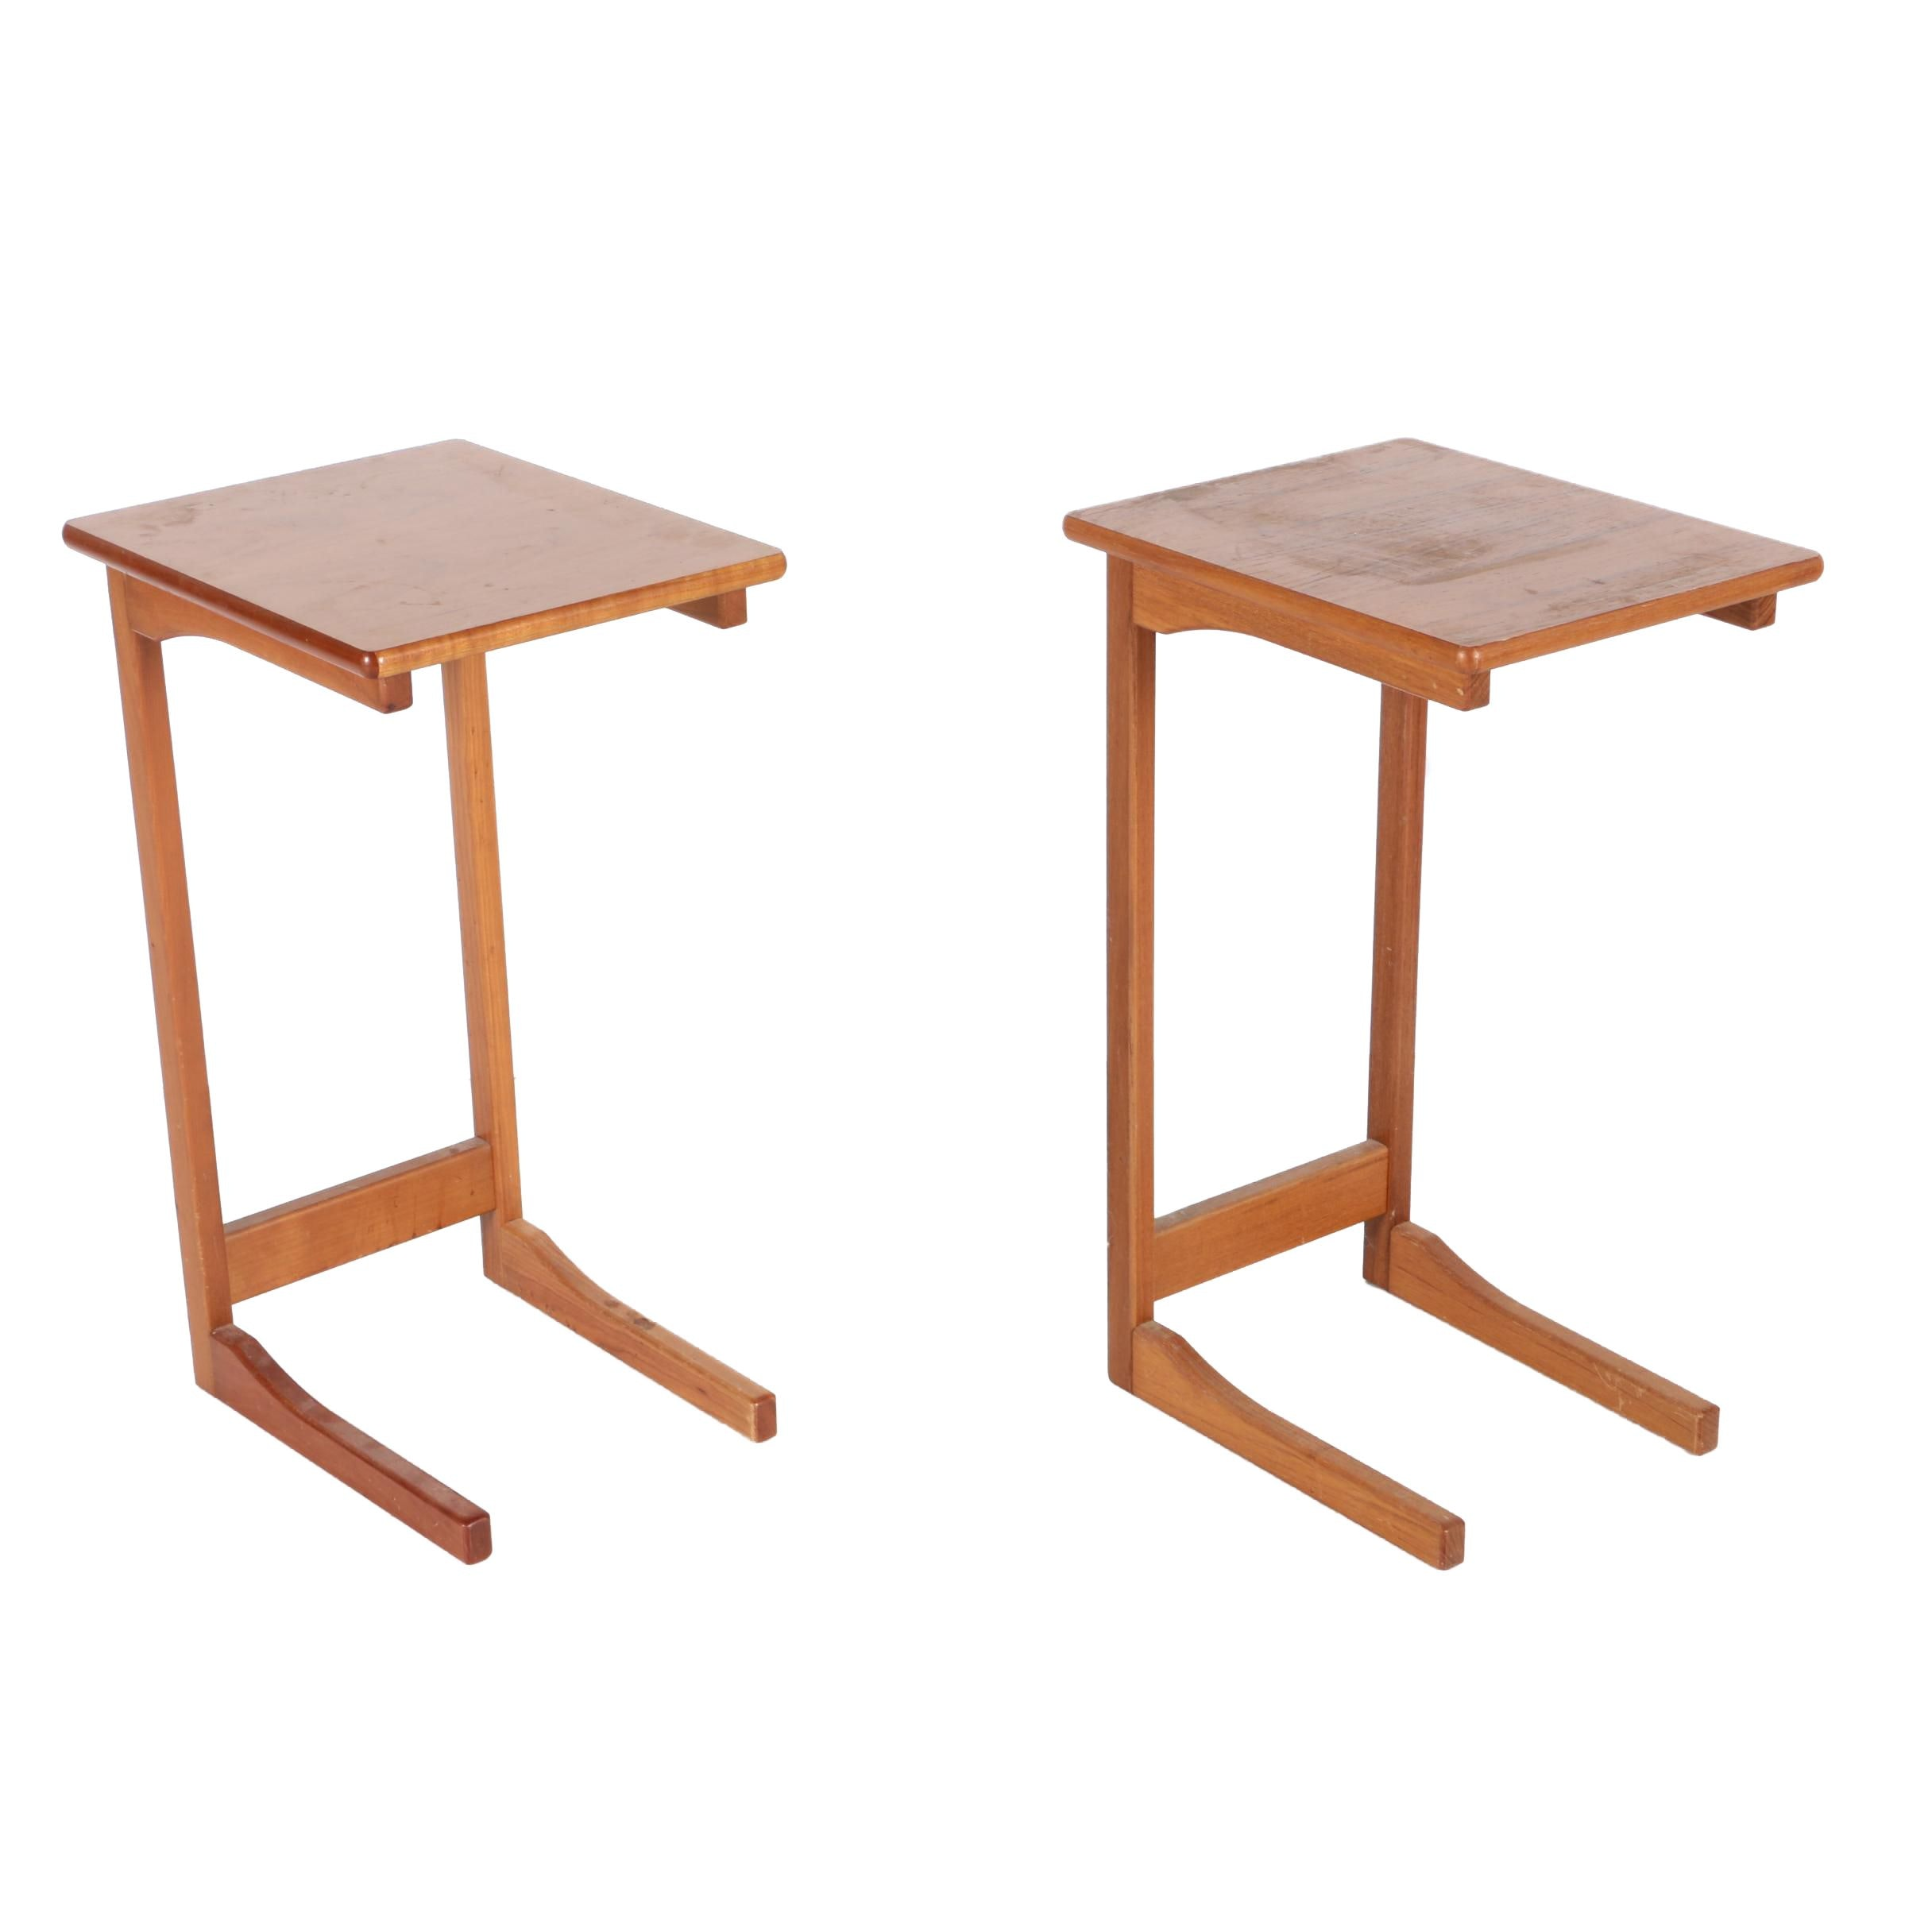 Two Danish Modern Teak Writing Stands by FBJ Møbler